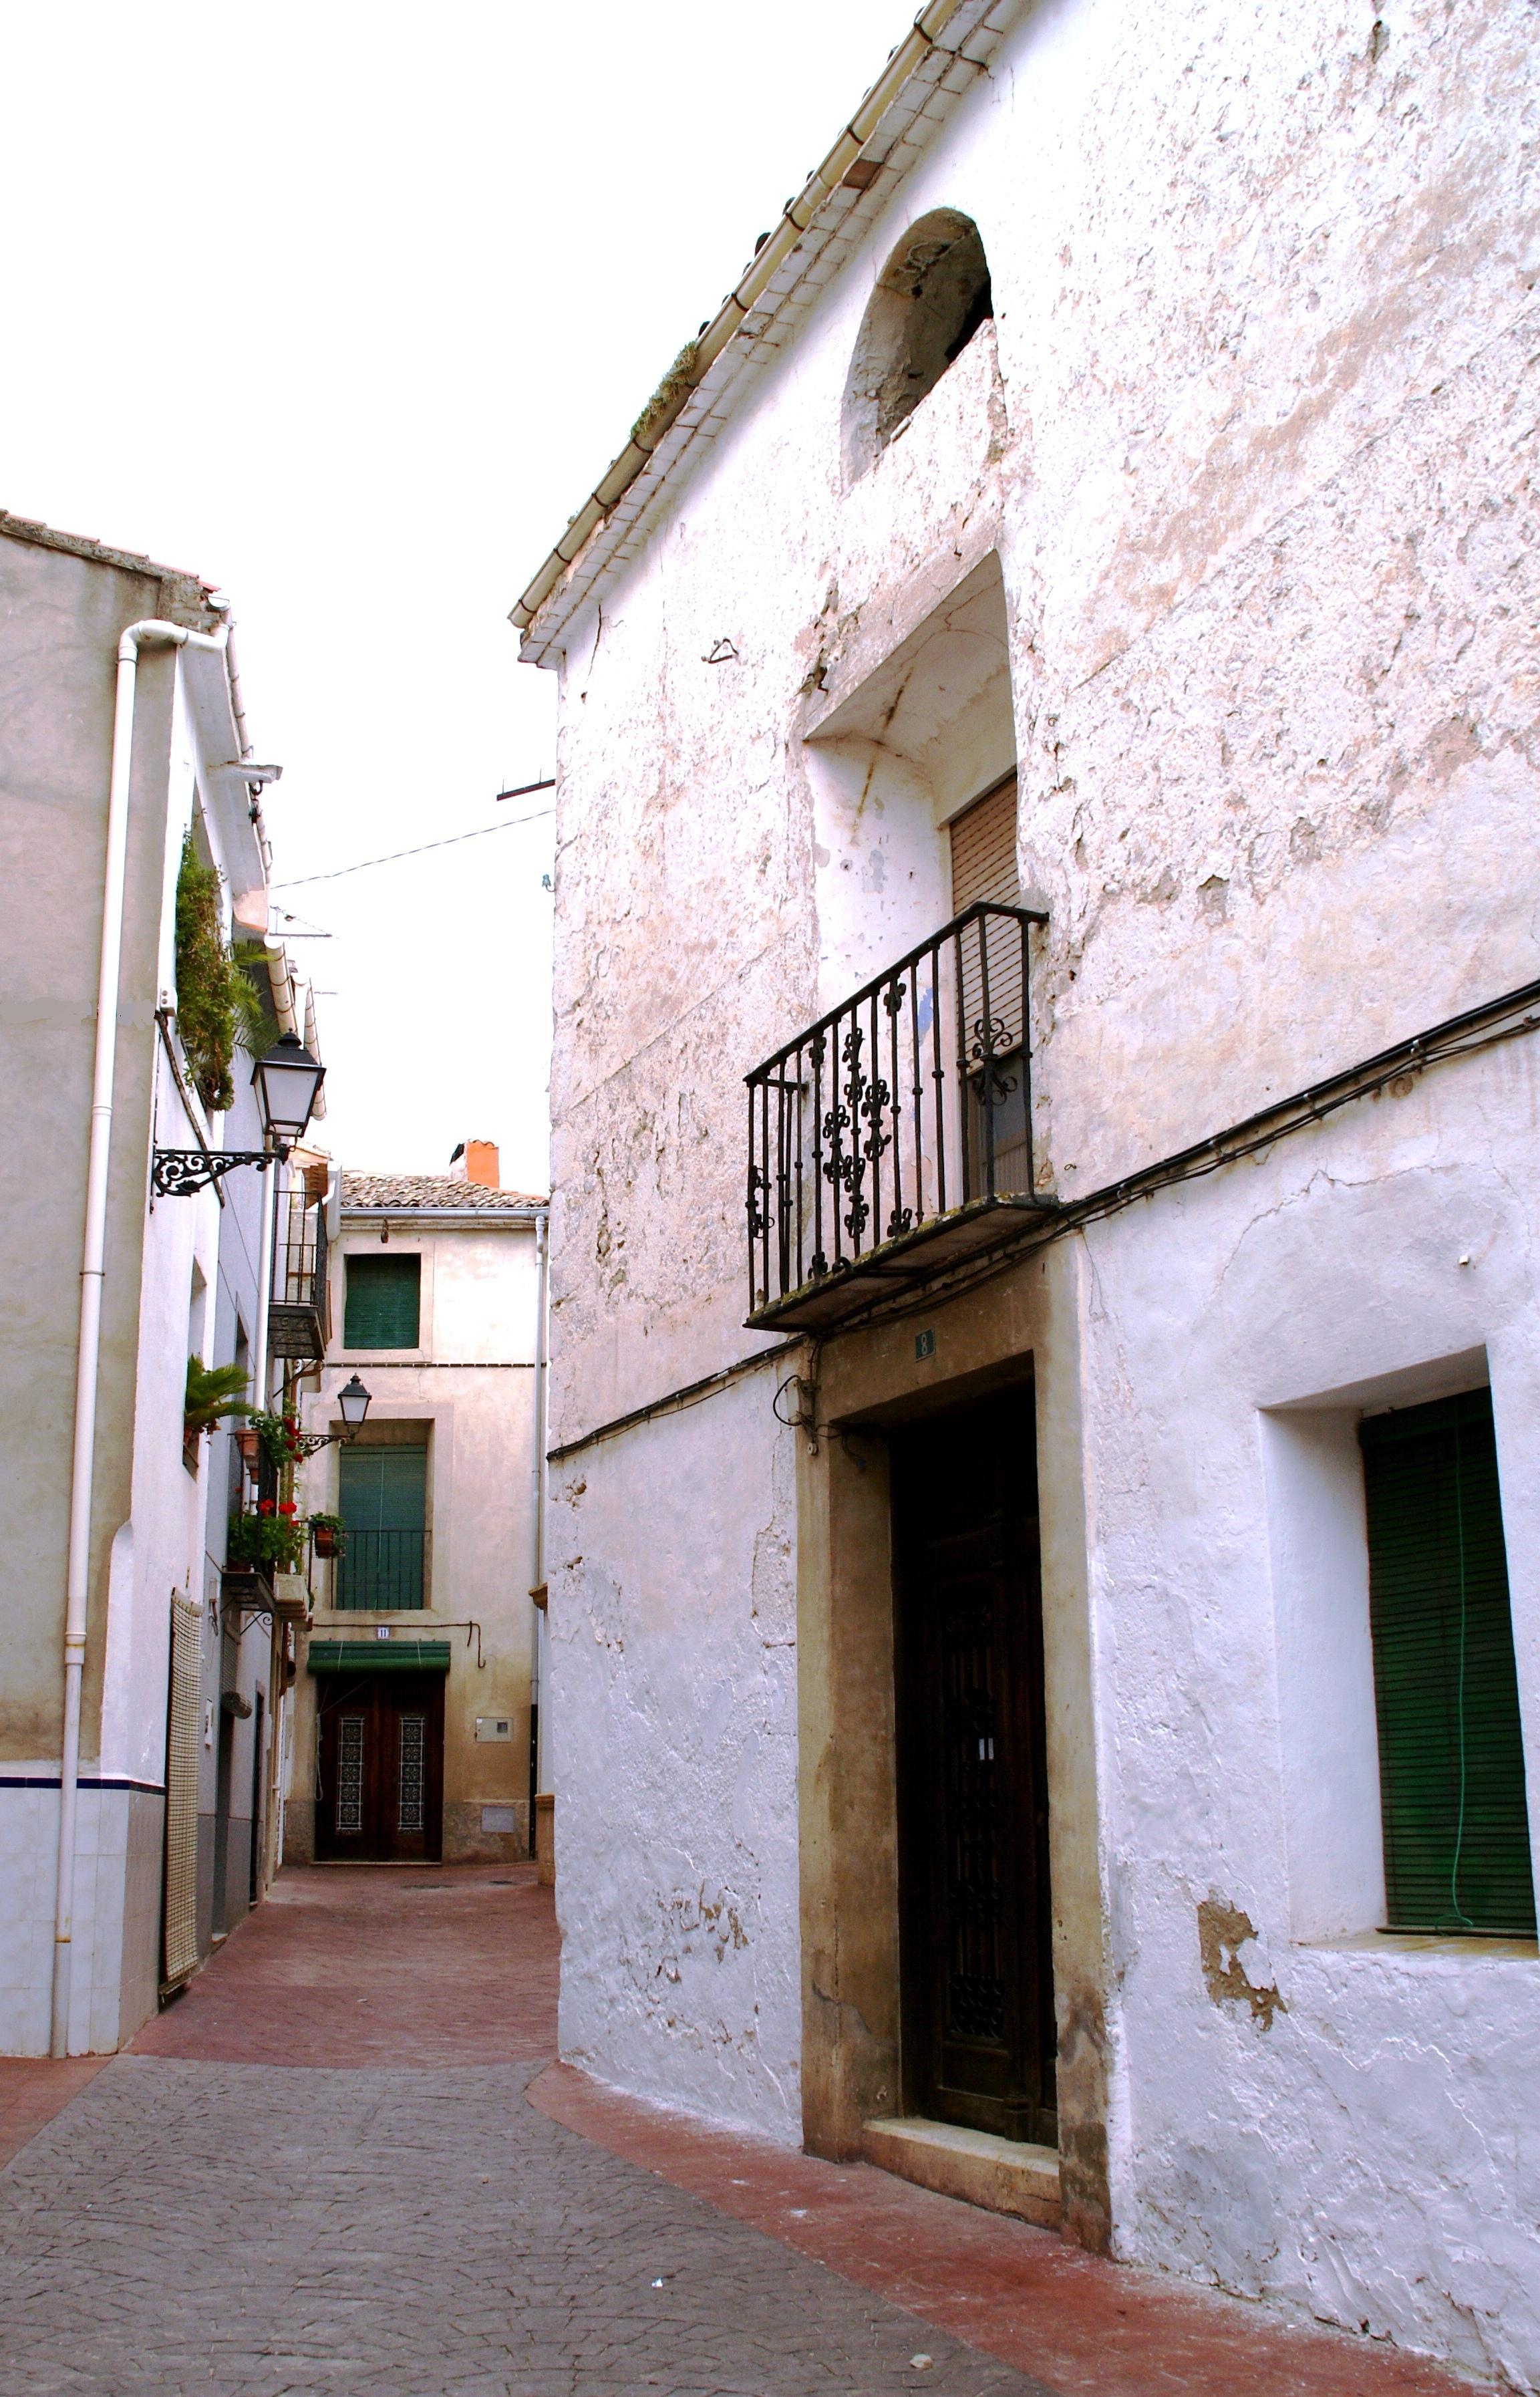 Playa de Muchavista, bet at home Angebotscode bestehende Kunden bet at home Pferd Ergebnisse El Campello, Alicante. @ivan_munoz